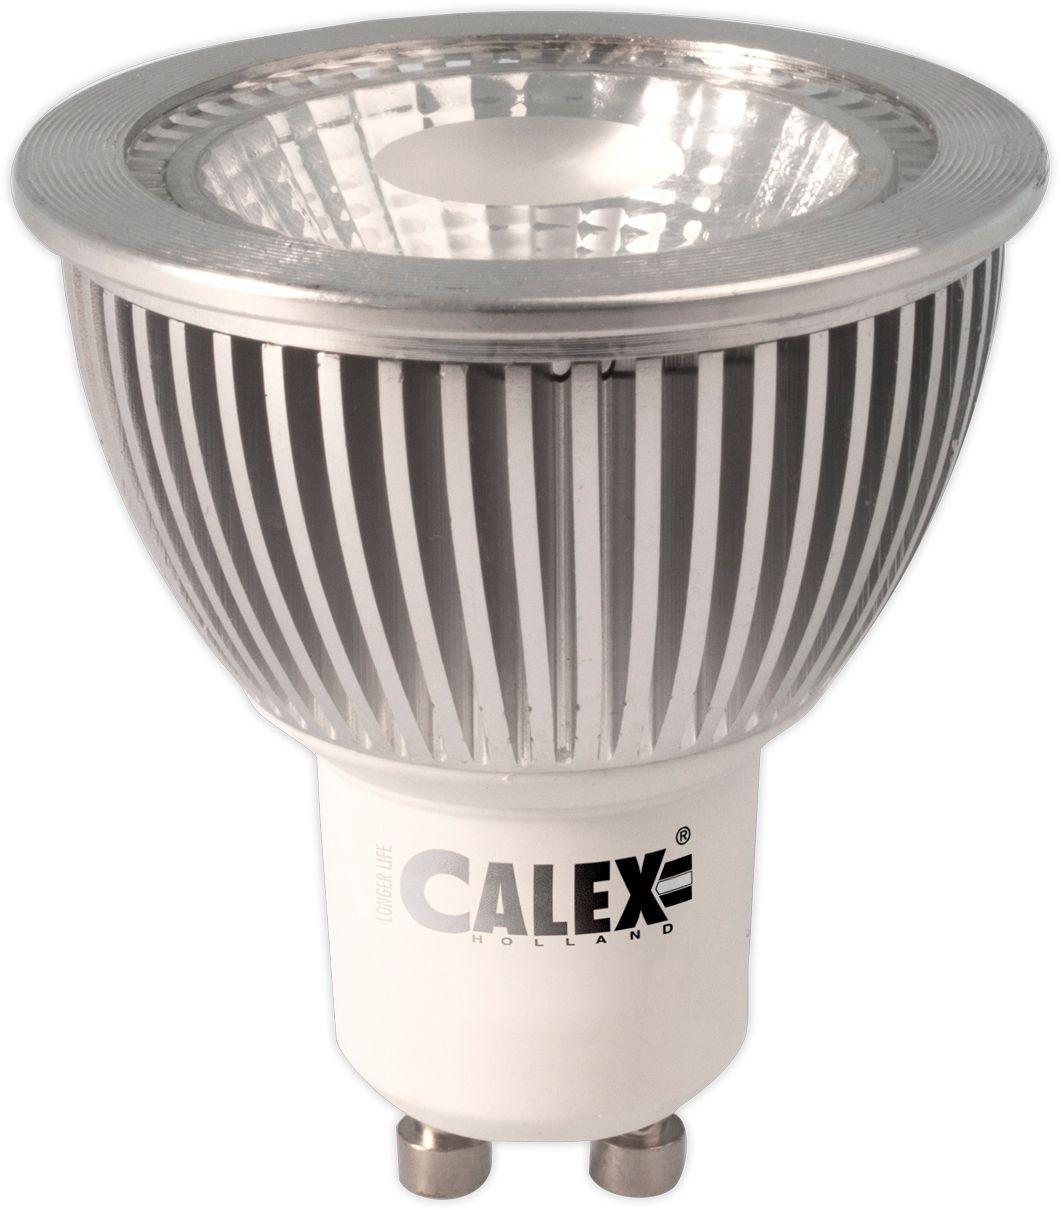 Image of Calex 6W LED COB GU10 Daylight 6500K 370 Lumen Dimmable Bulb